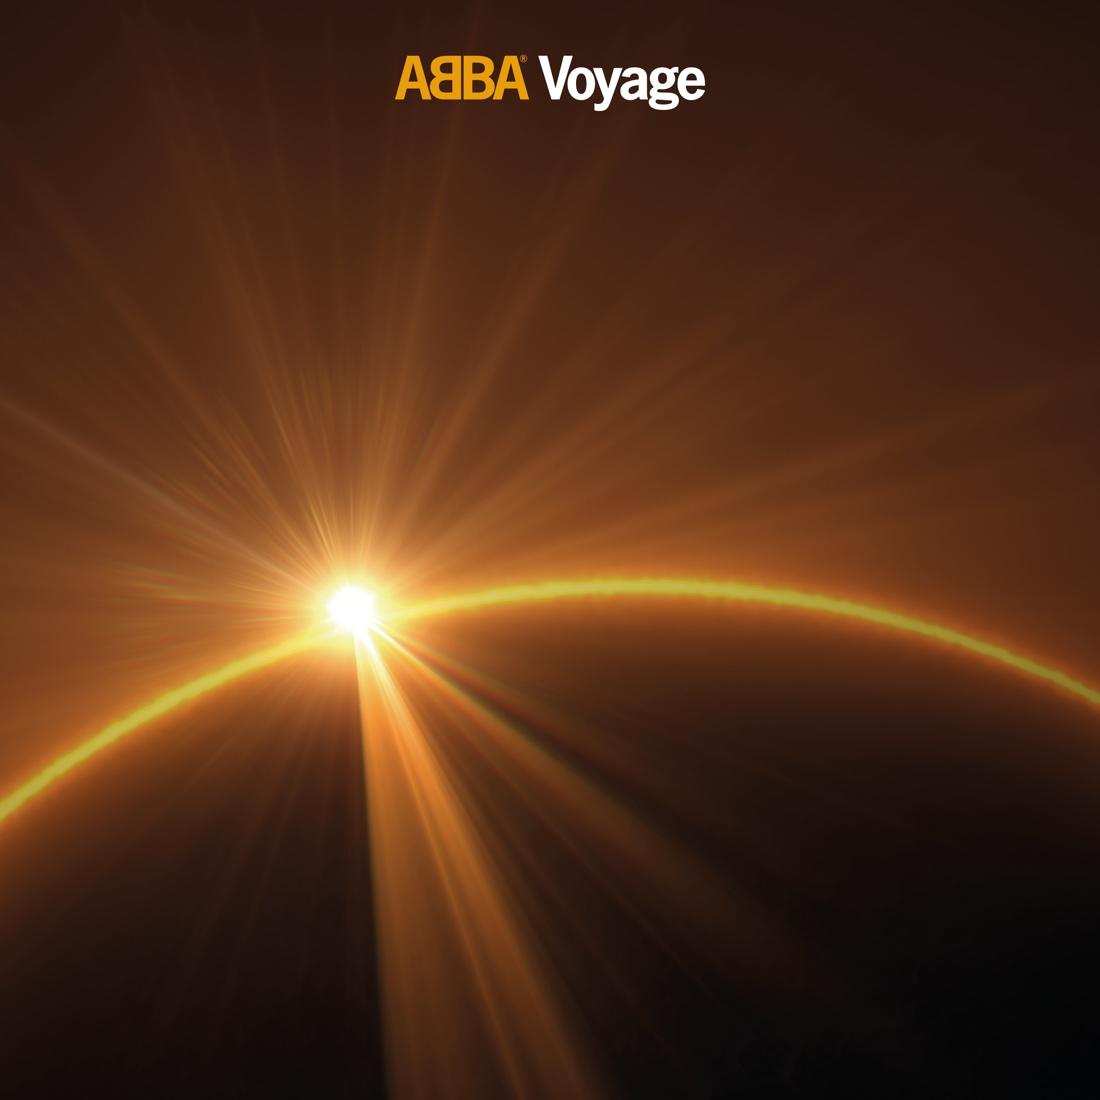 Agnetha, Björn, Benny and Anni Frid return with ABBA VOYAGE   UMG